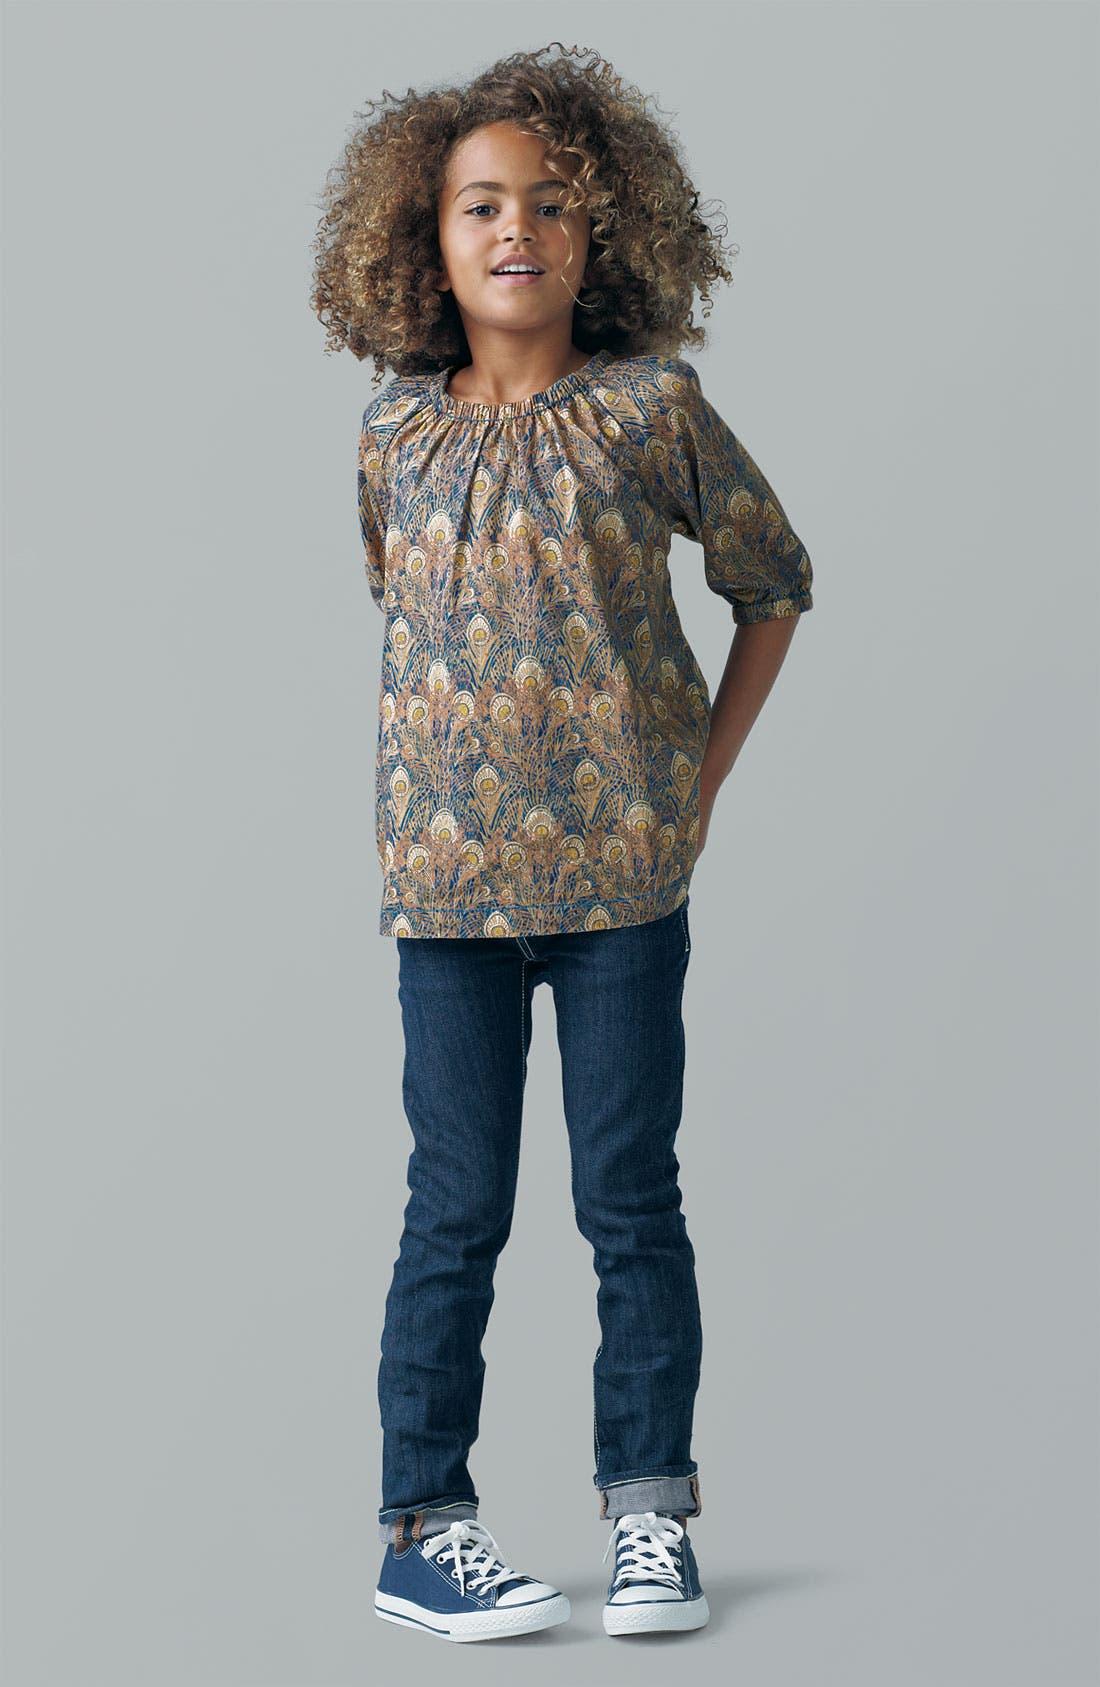 Alternate Image 1 Selected - Peek Top & Jeans (Toddler, Little Girls & Big Girls)